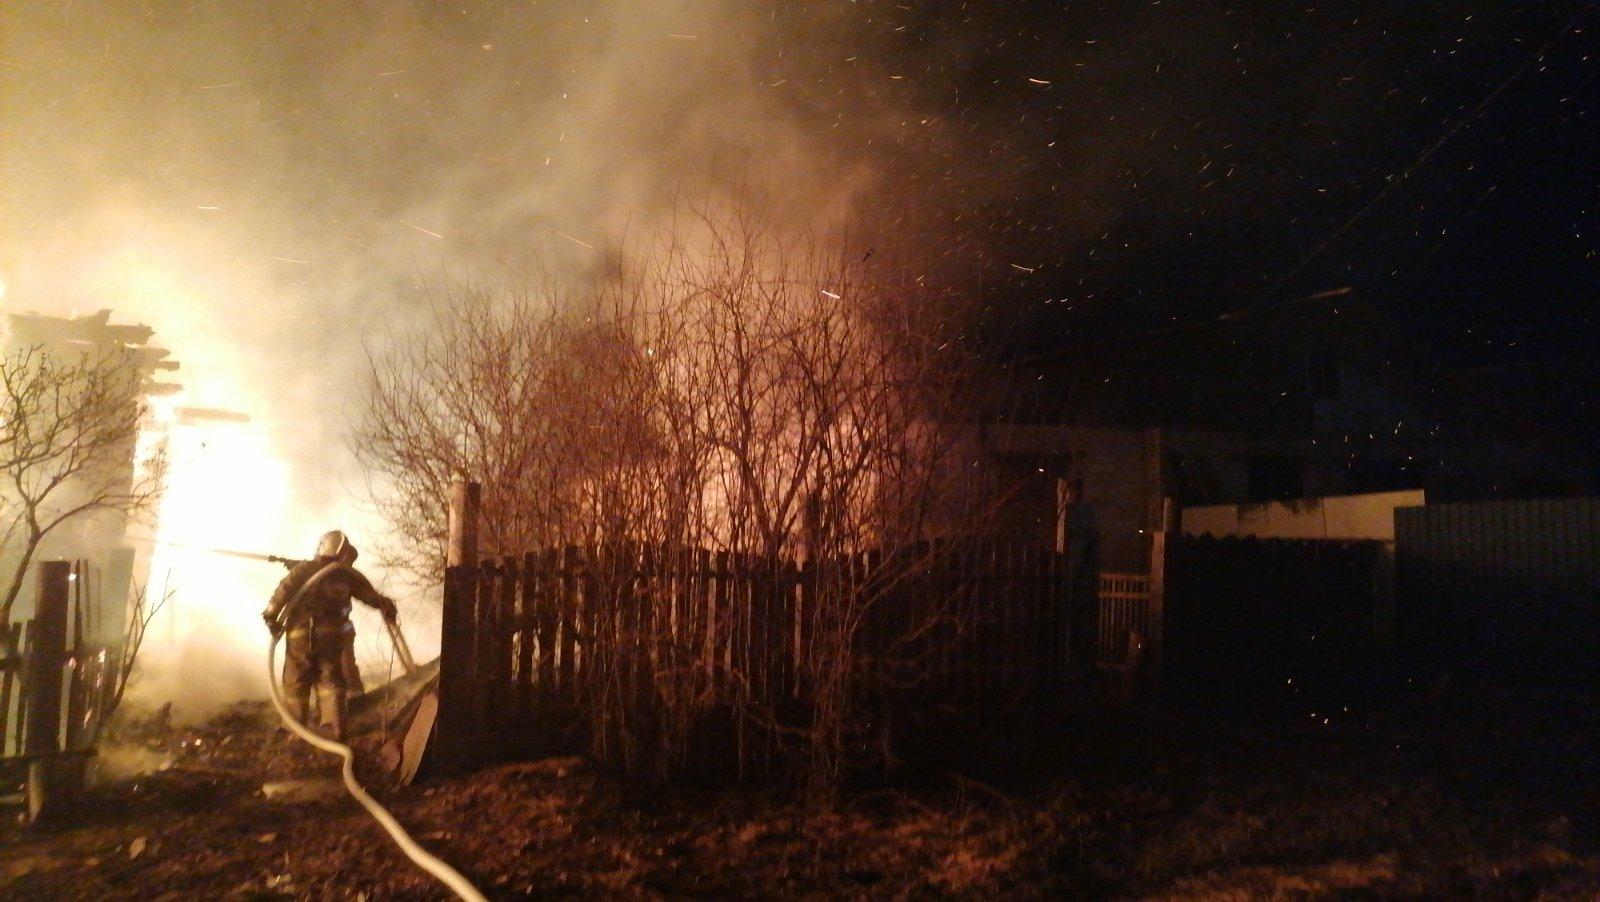 Пожар Ковровский район, с. Крутово, ул. Тонеева, д. 26